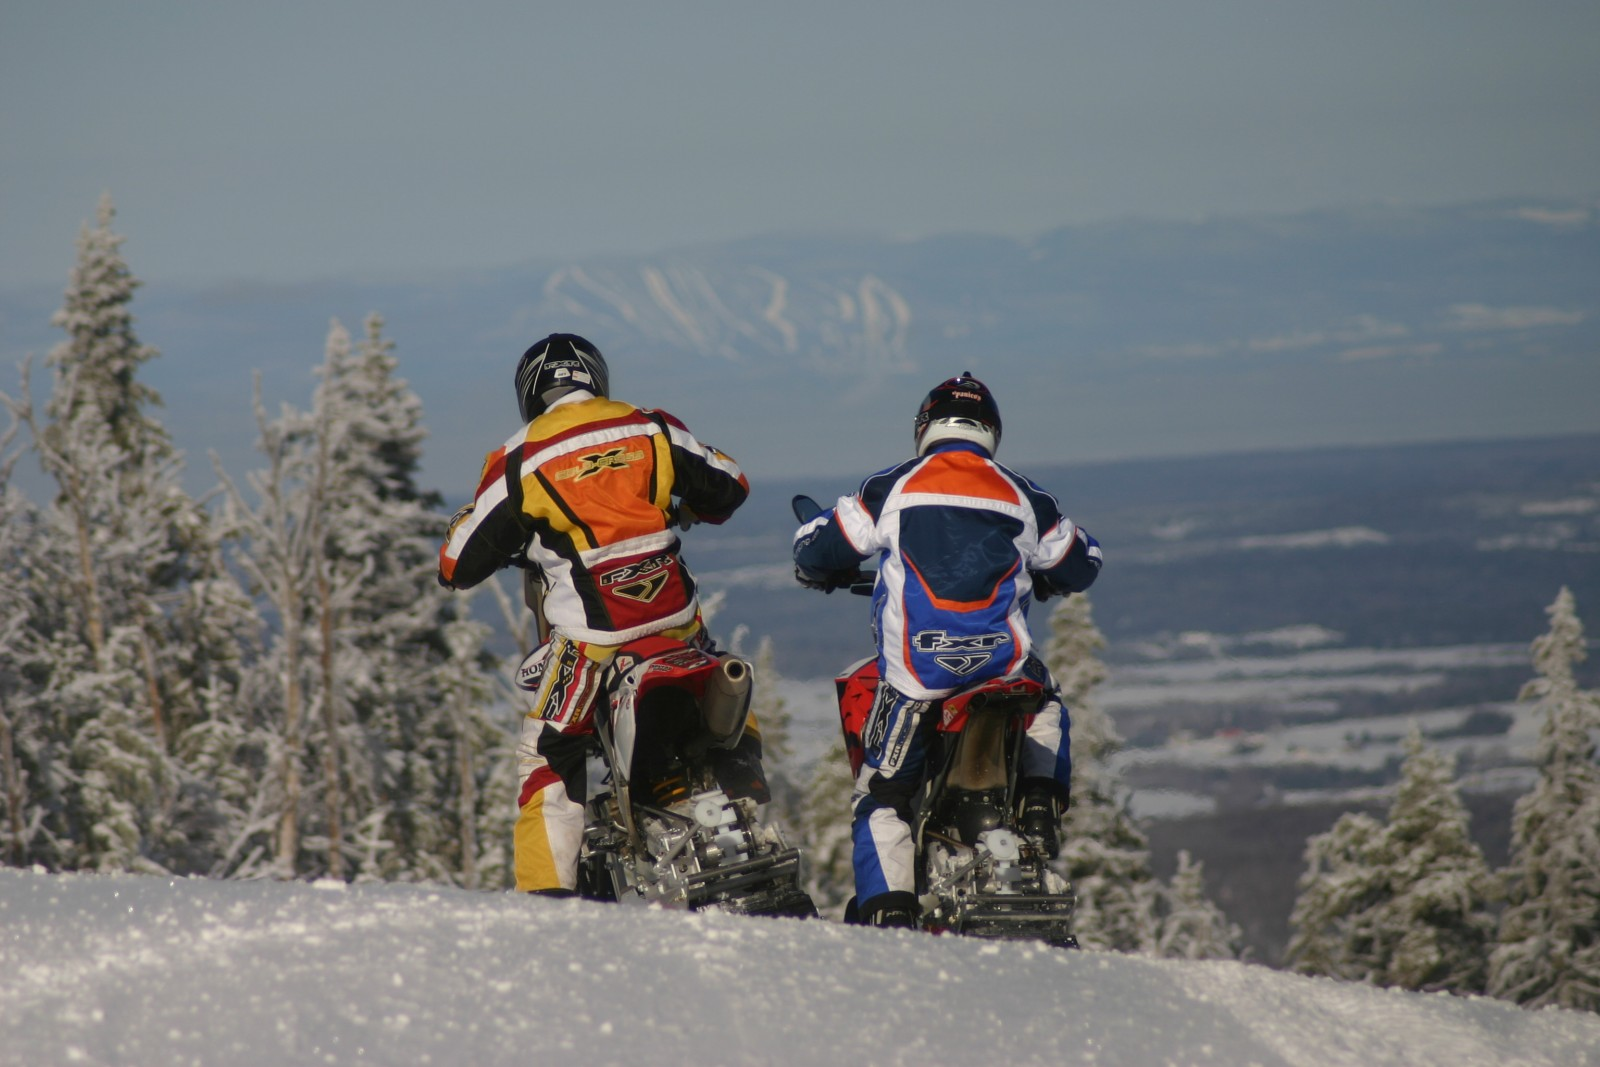 Explorer-snowbike-track-system-for-dirt-bike-supermoto-enduro-mx-AD-Boivin-93-1600x1067